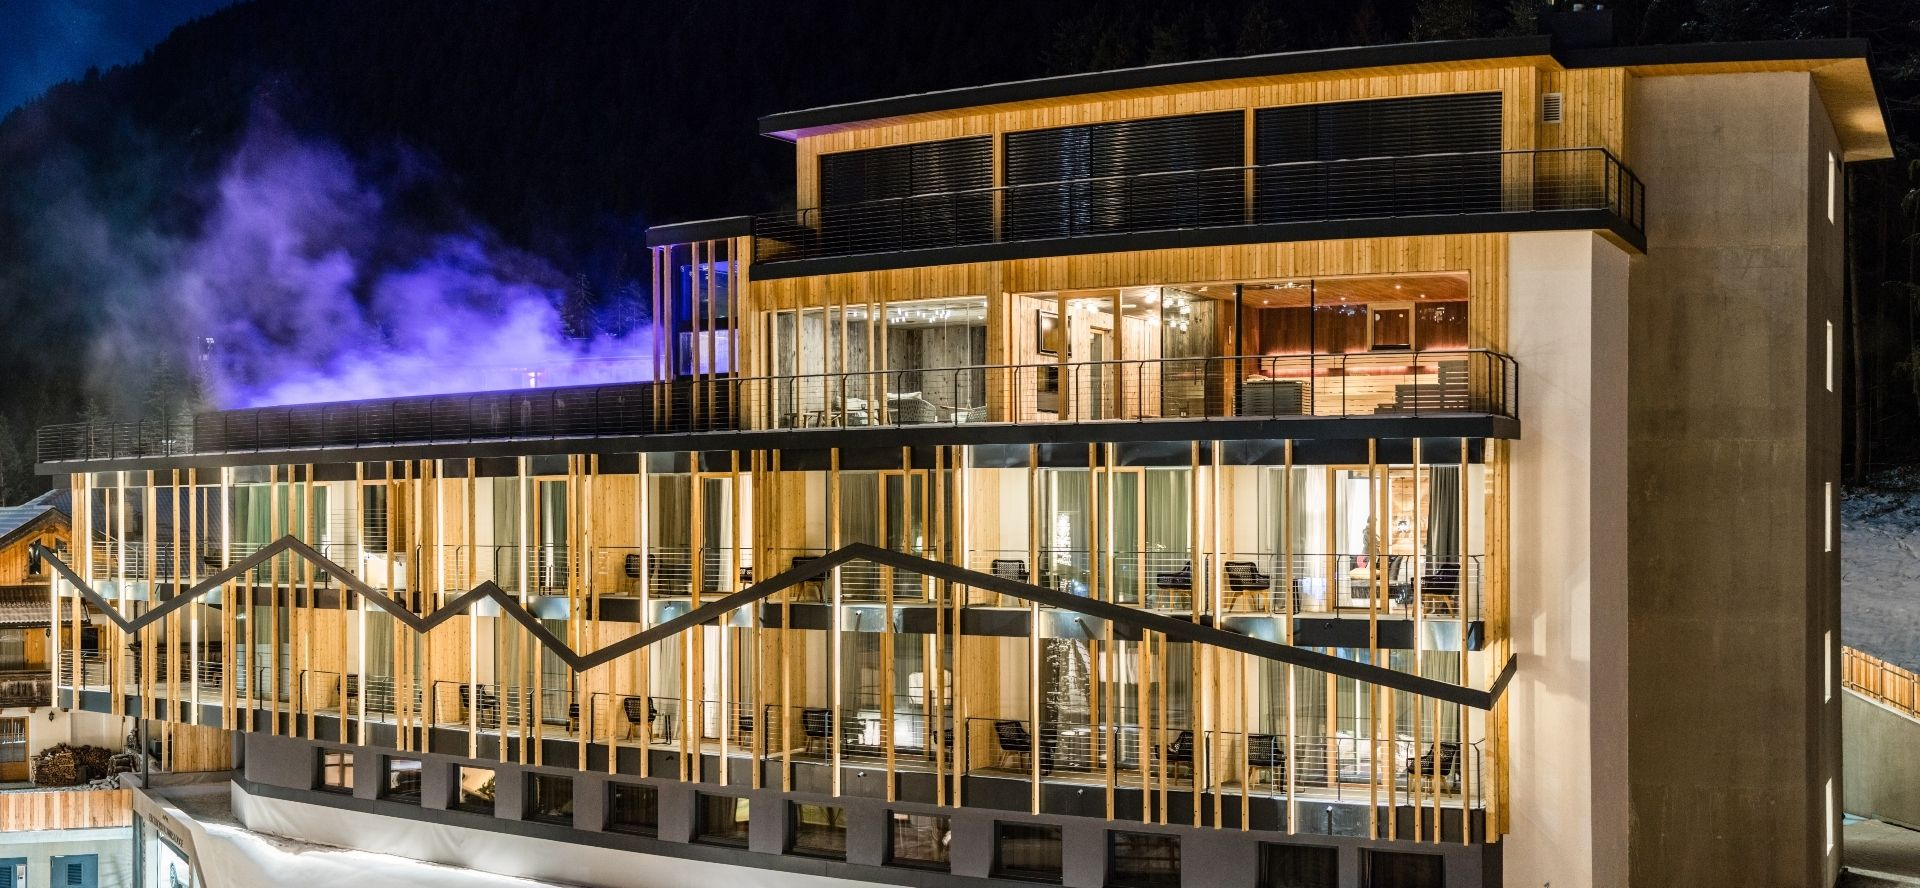 The Dolomites Lodge exterior